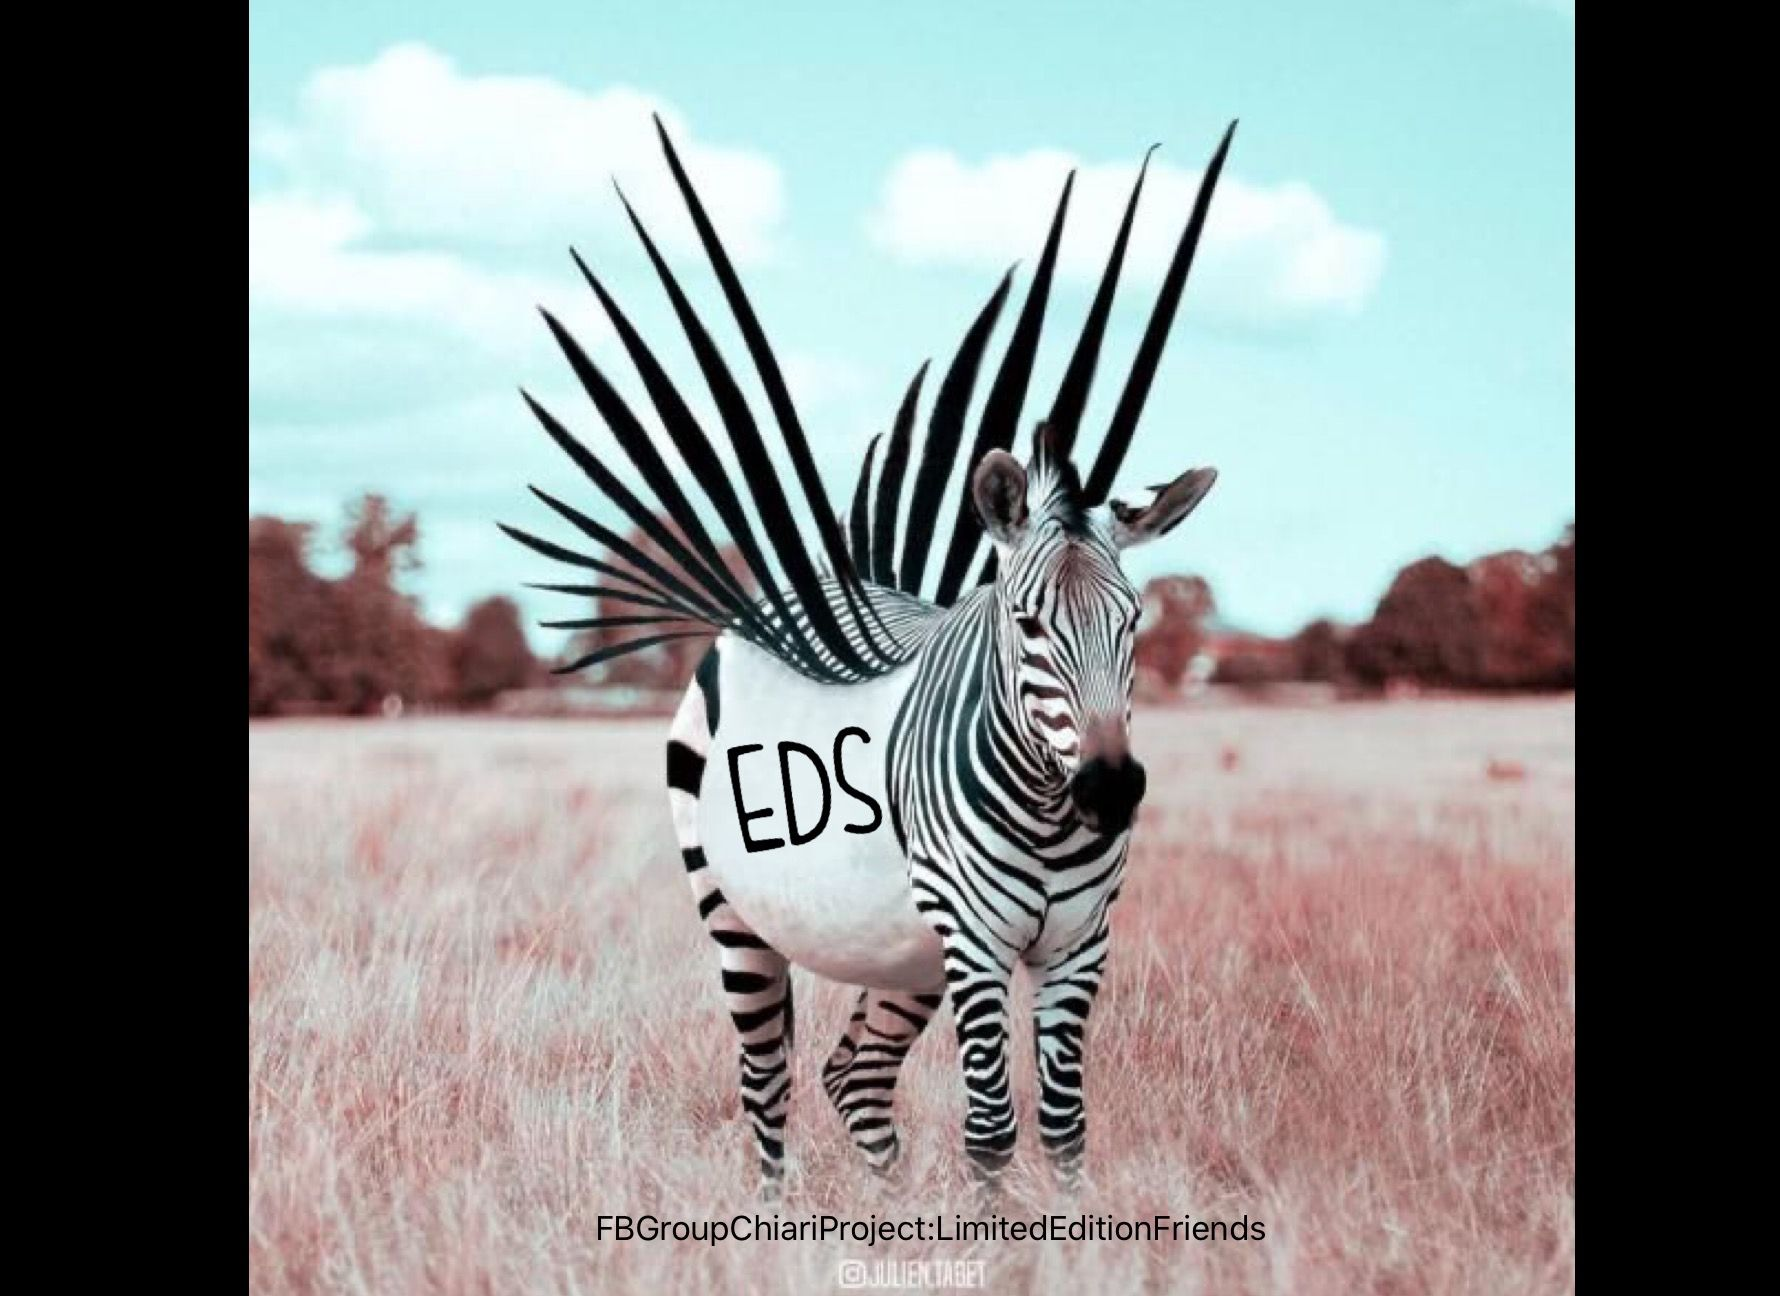 Mohawk in 2020 Zebras, Zebra, Stripes pattern